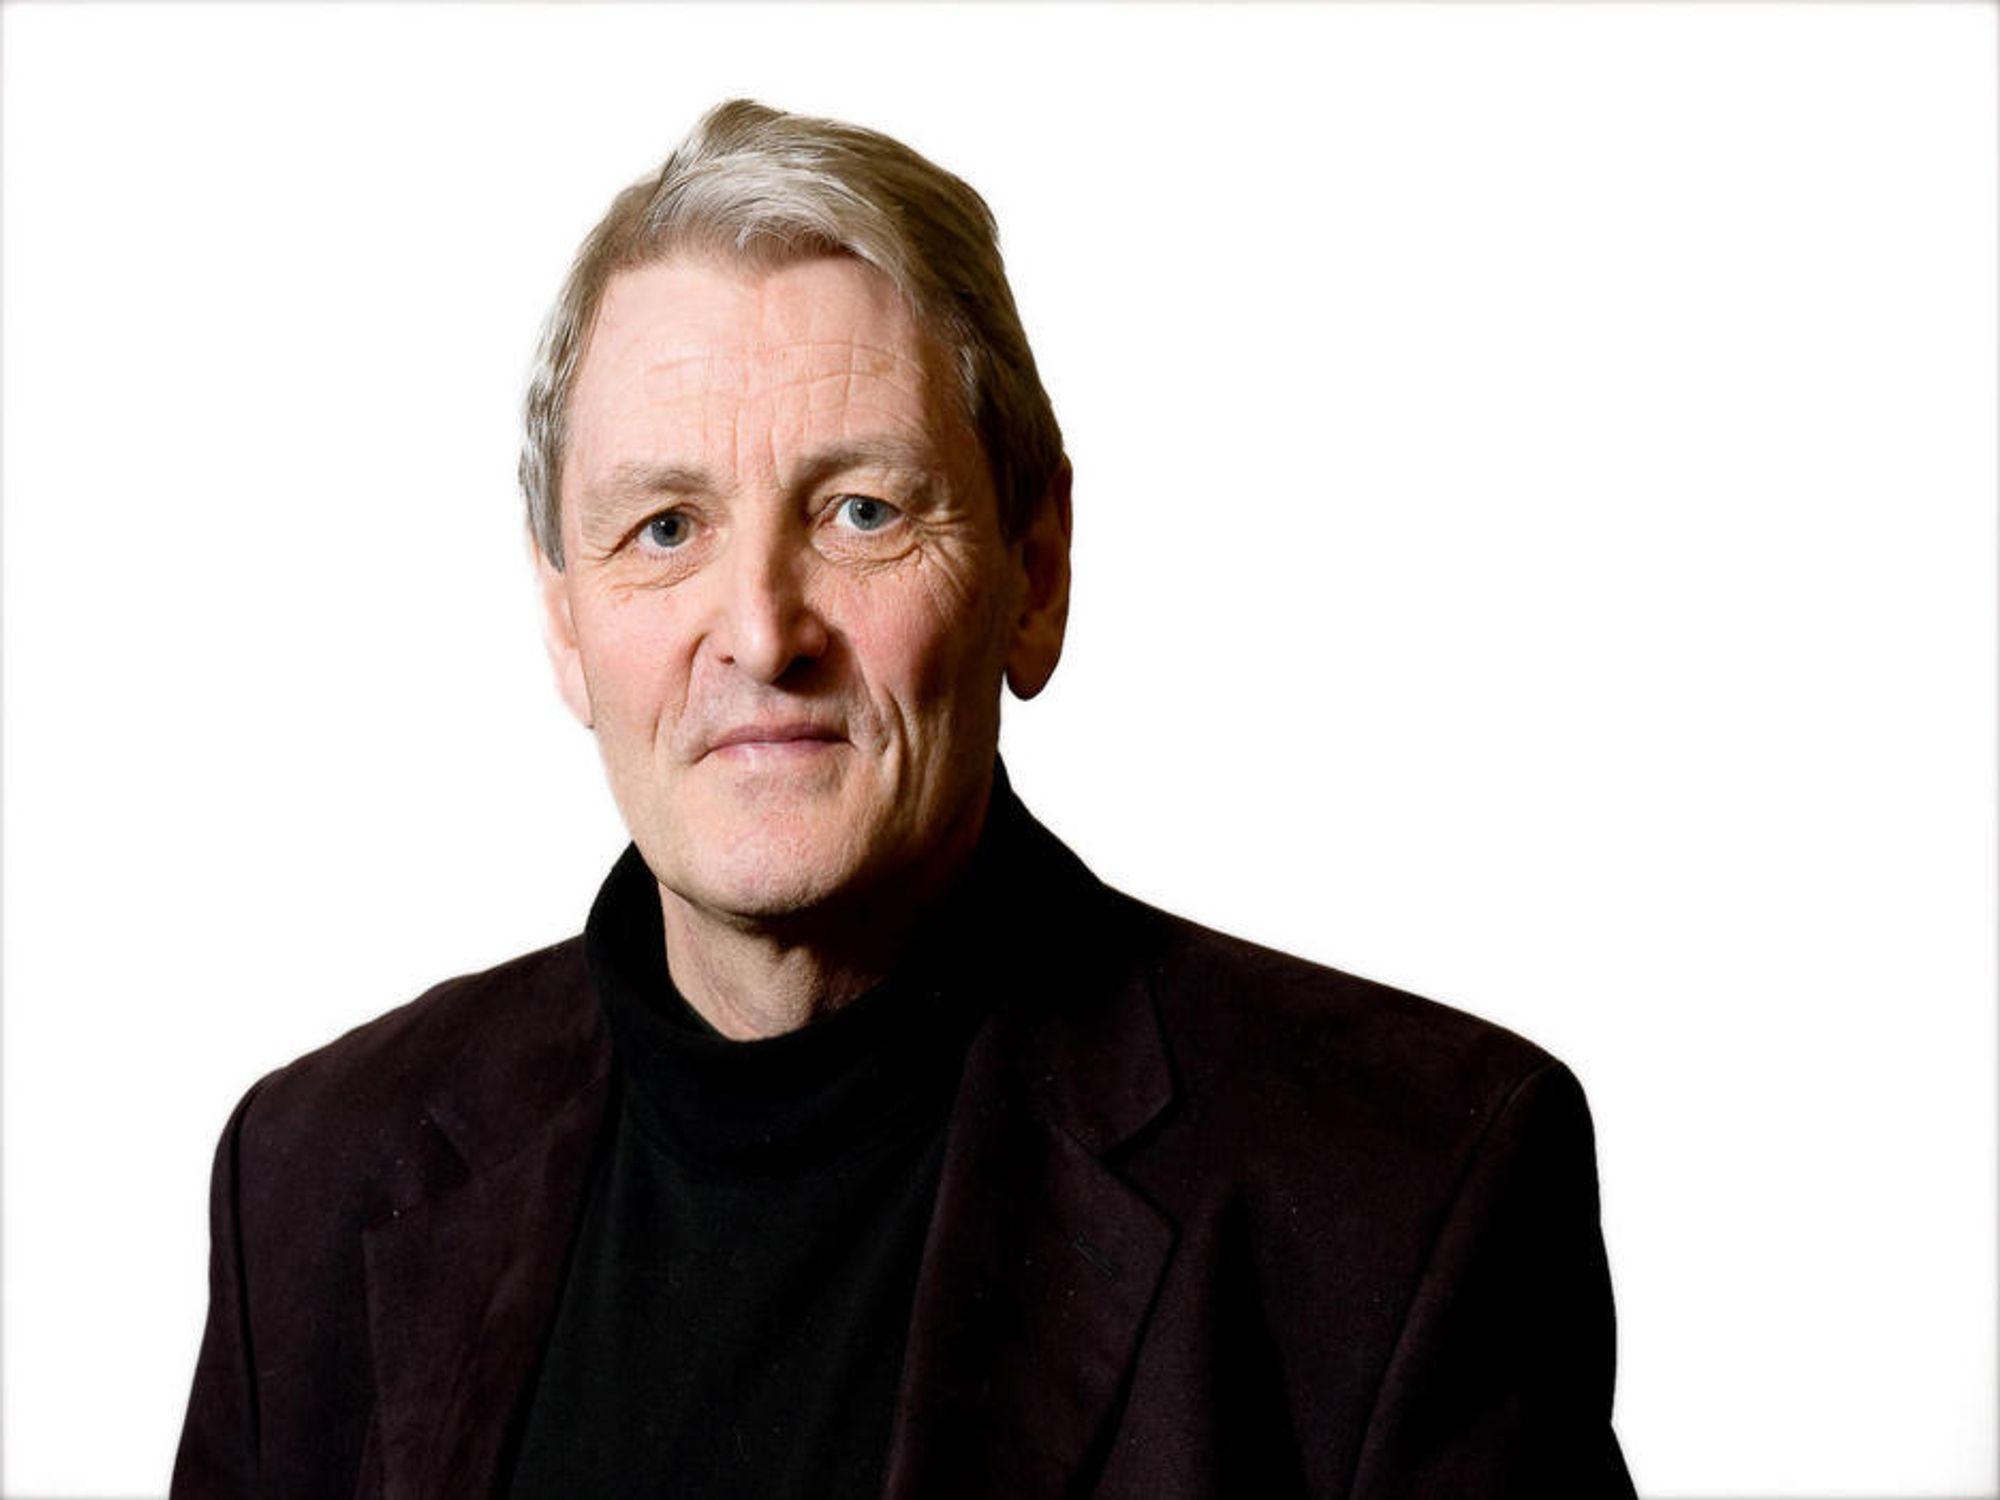 FORSKNINGSDIREKTØR: Alf Egil Holmelid (SV)  fra Kristiansand er den første representant fra teknologisk forskningsmiljø på lang tid.